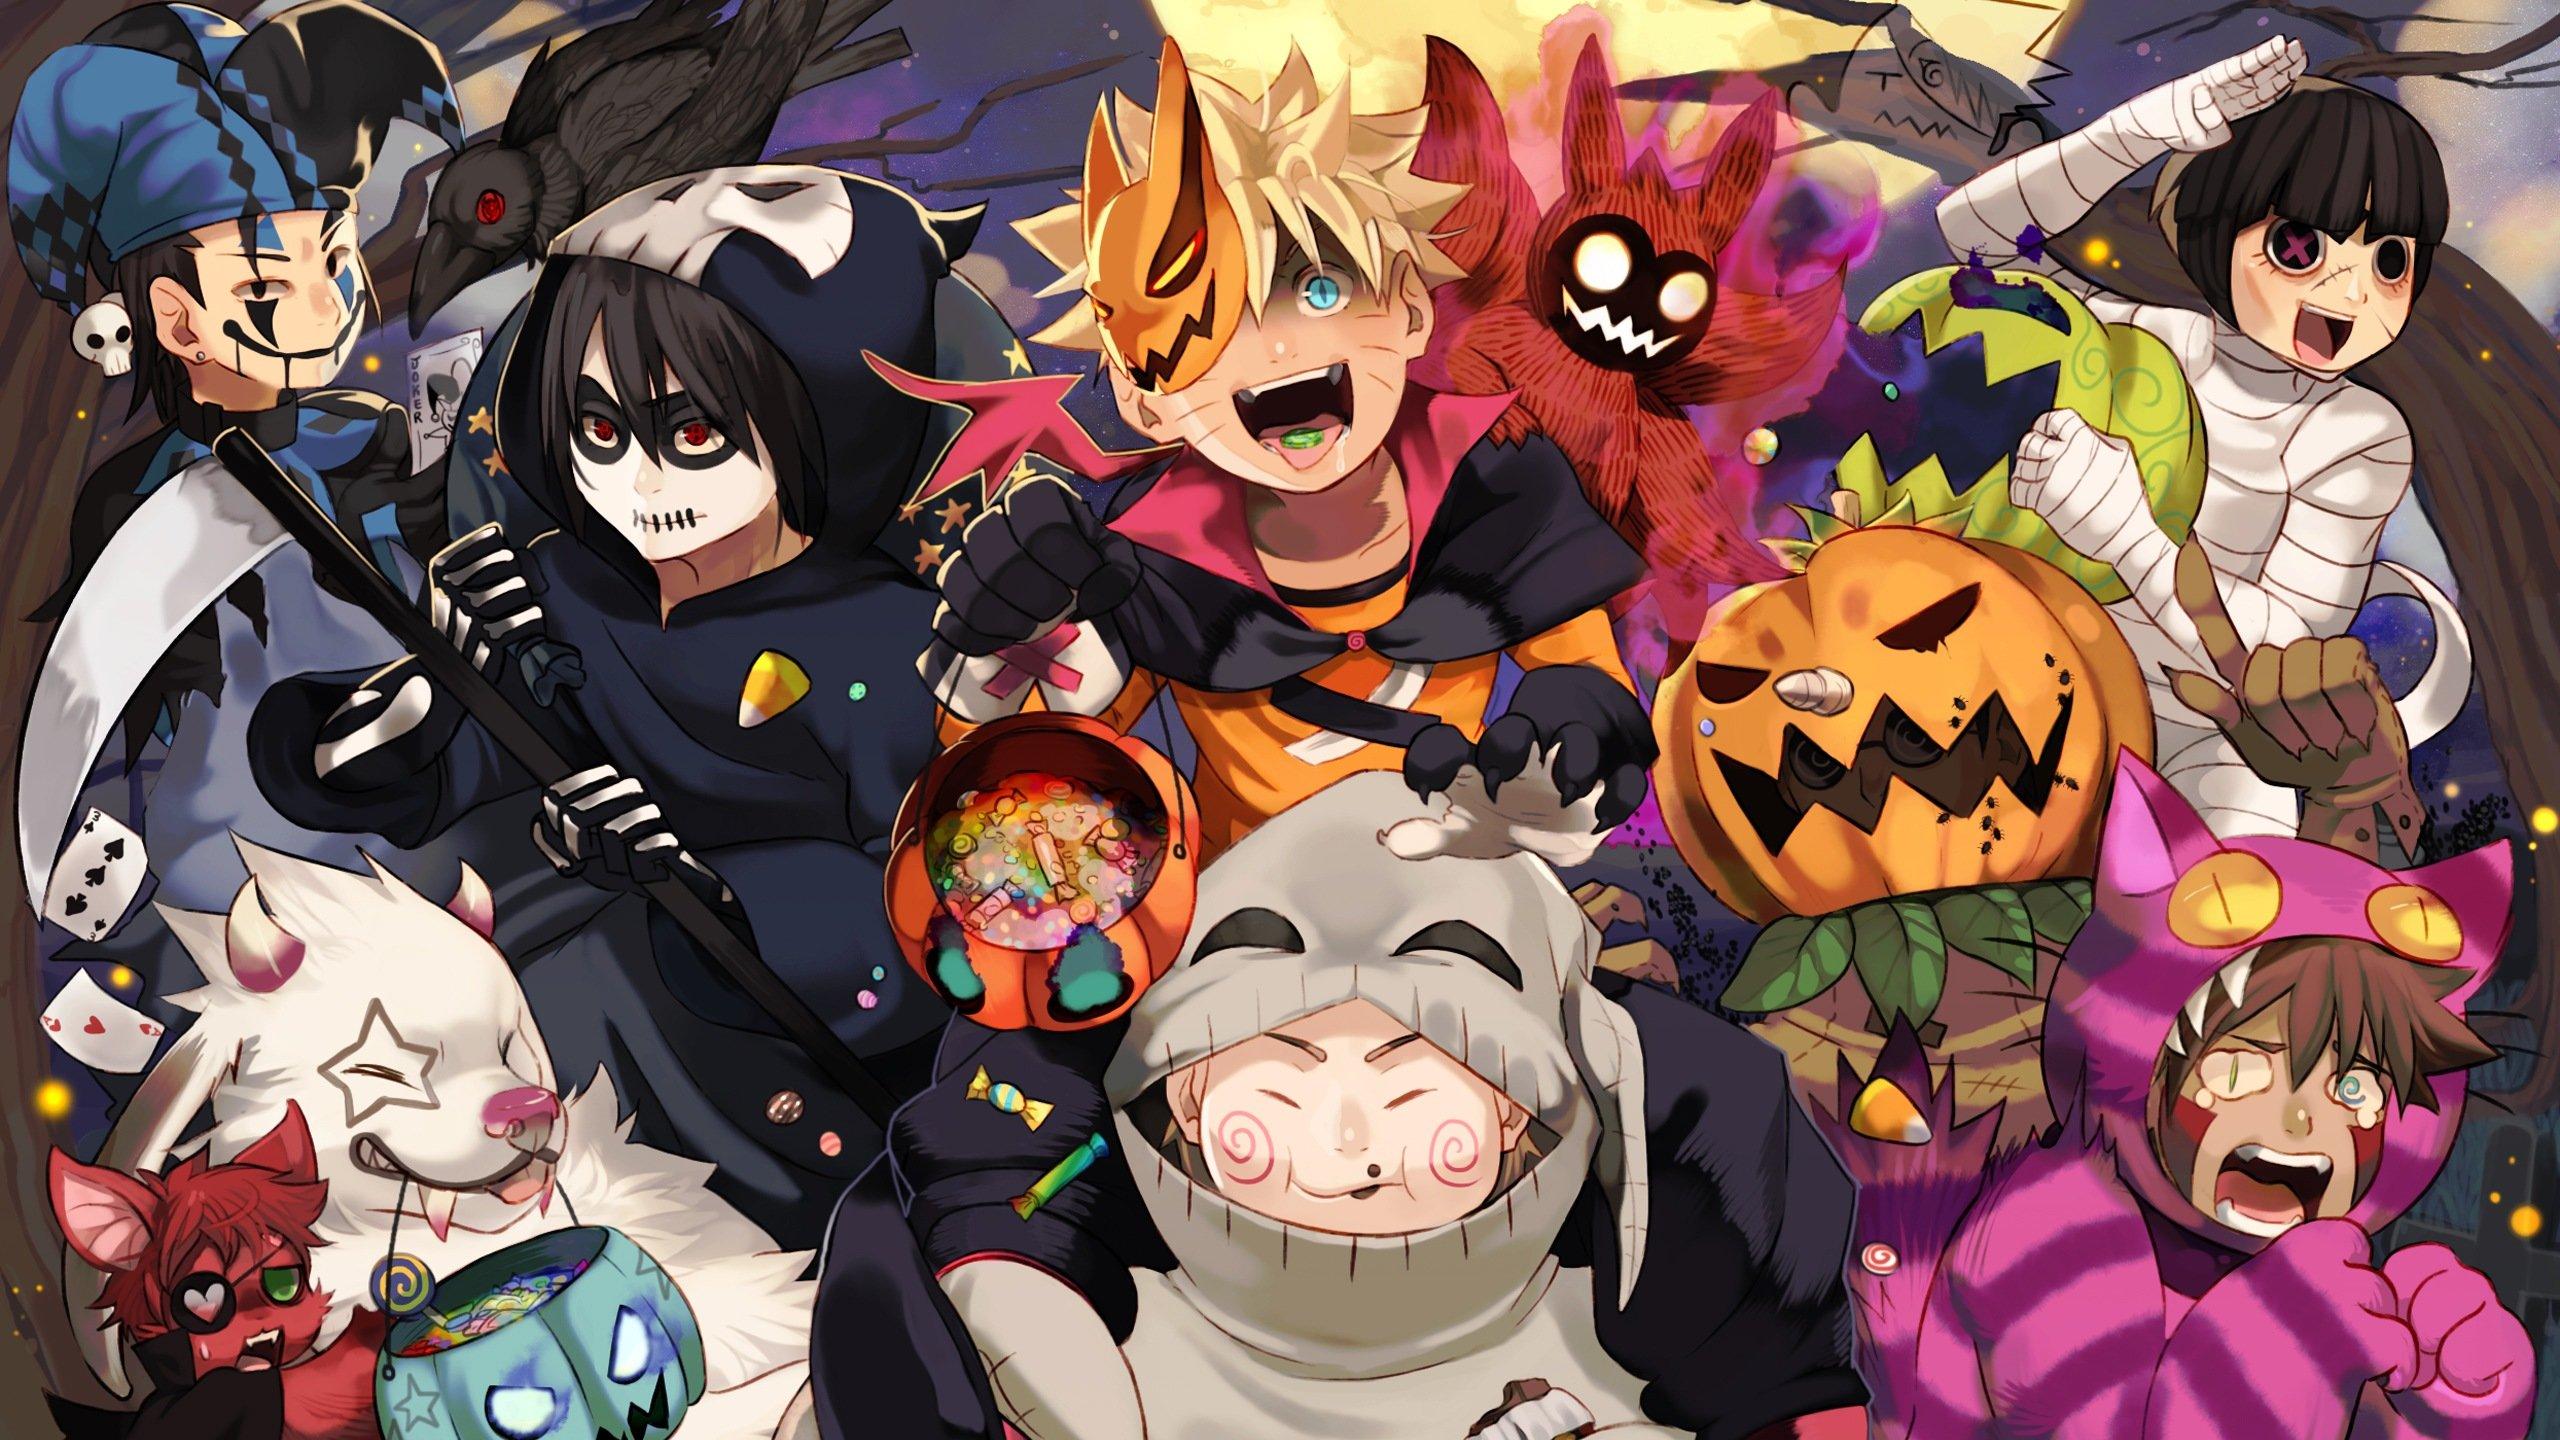 Naruto Wallpapers 2560x1440 Desktop Backgrounds